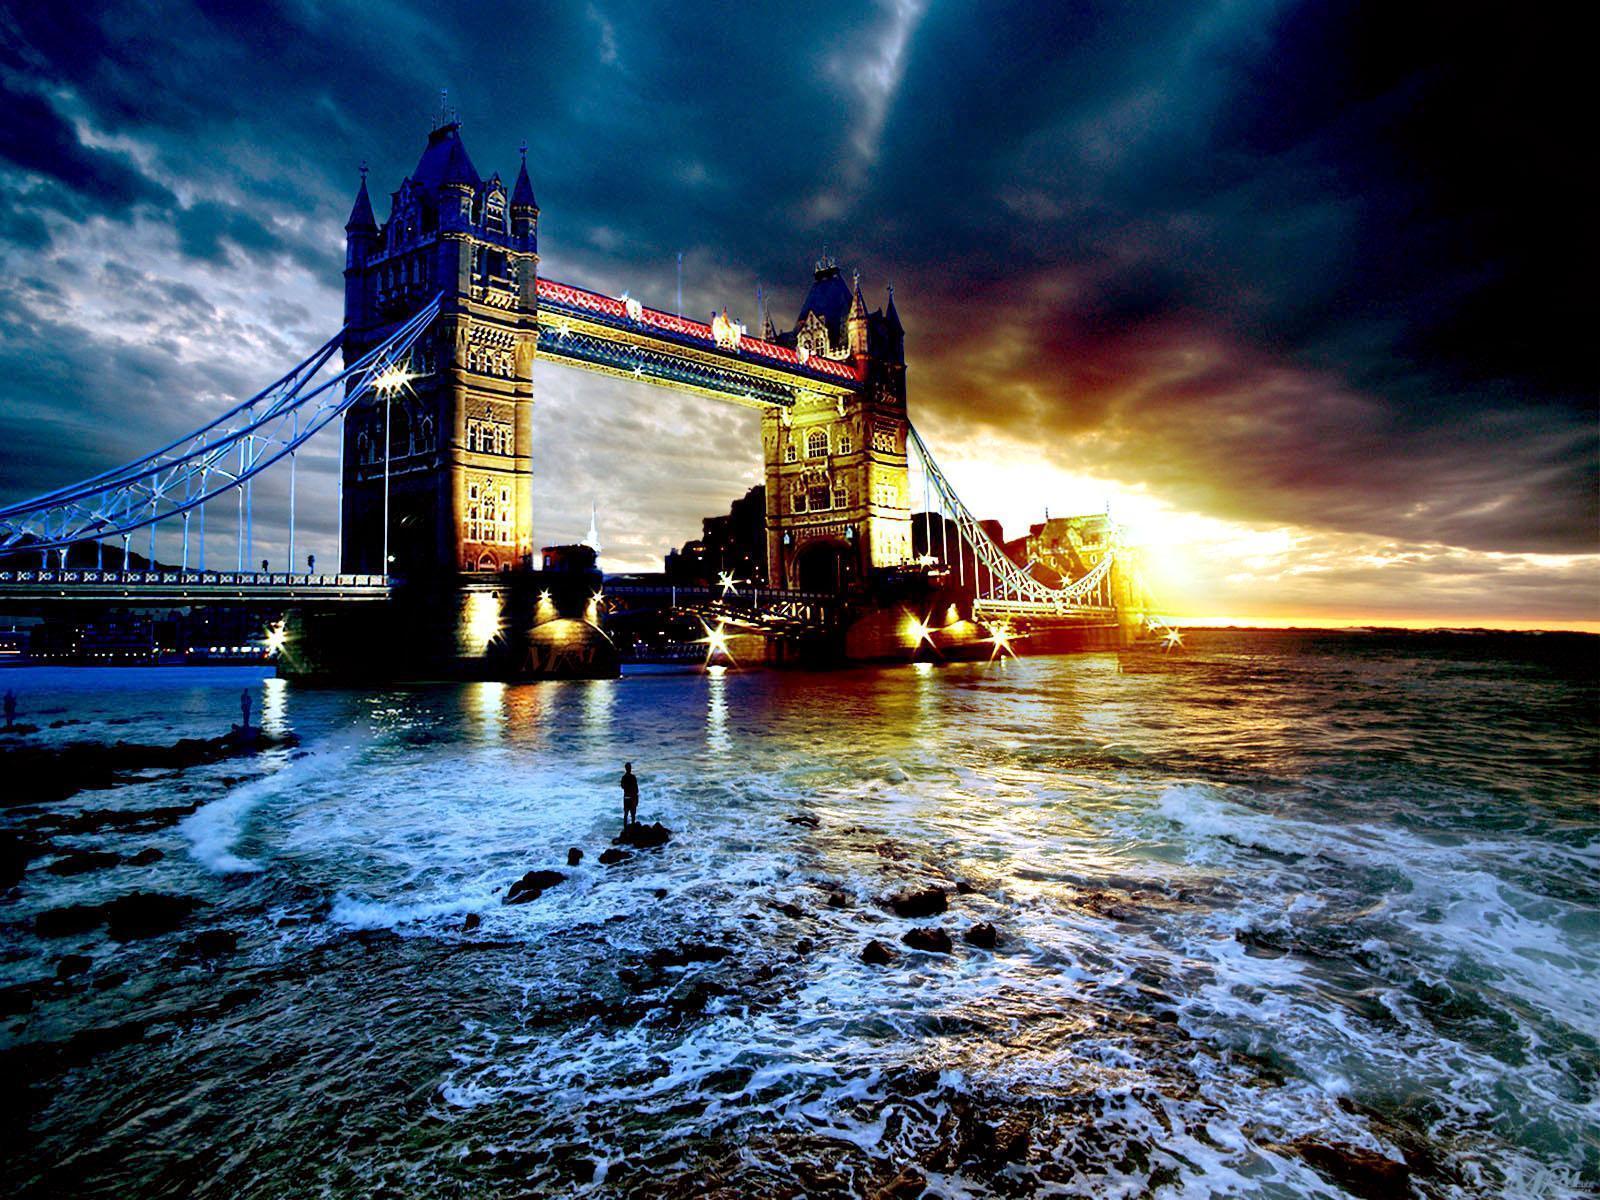 wallpaper bridge london scenic - photo #17